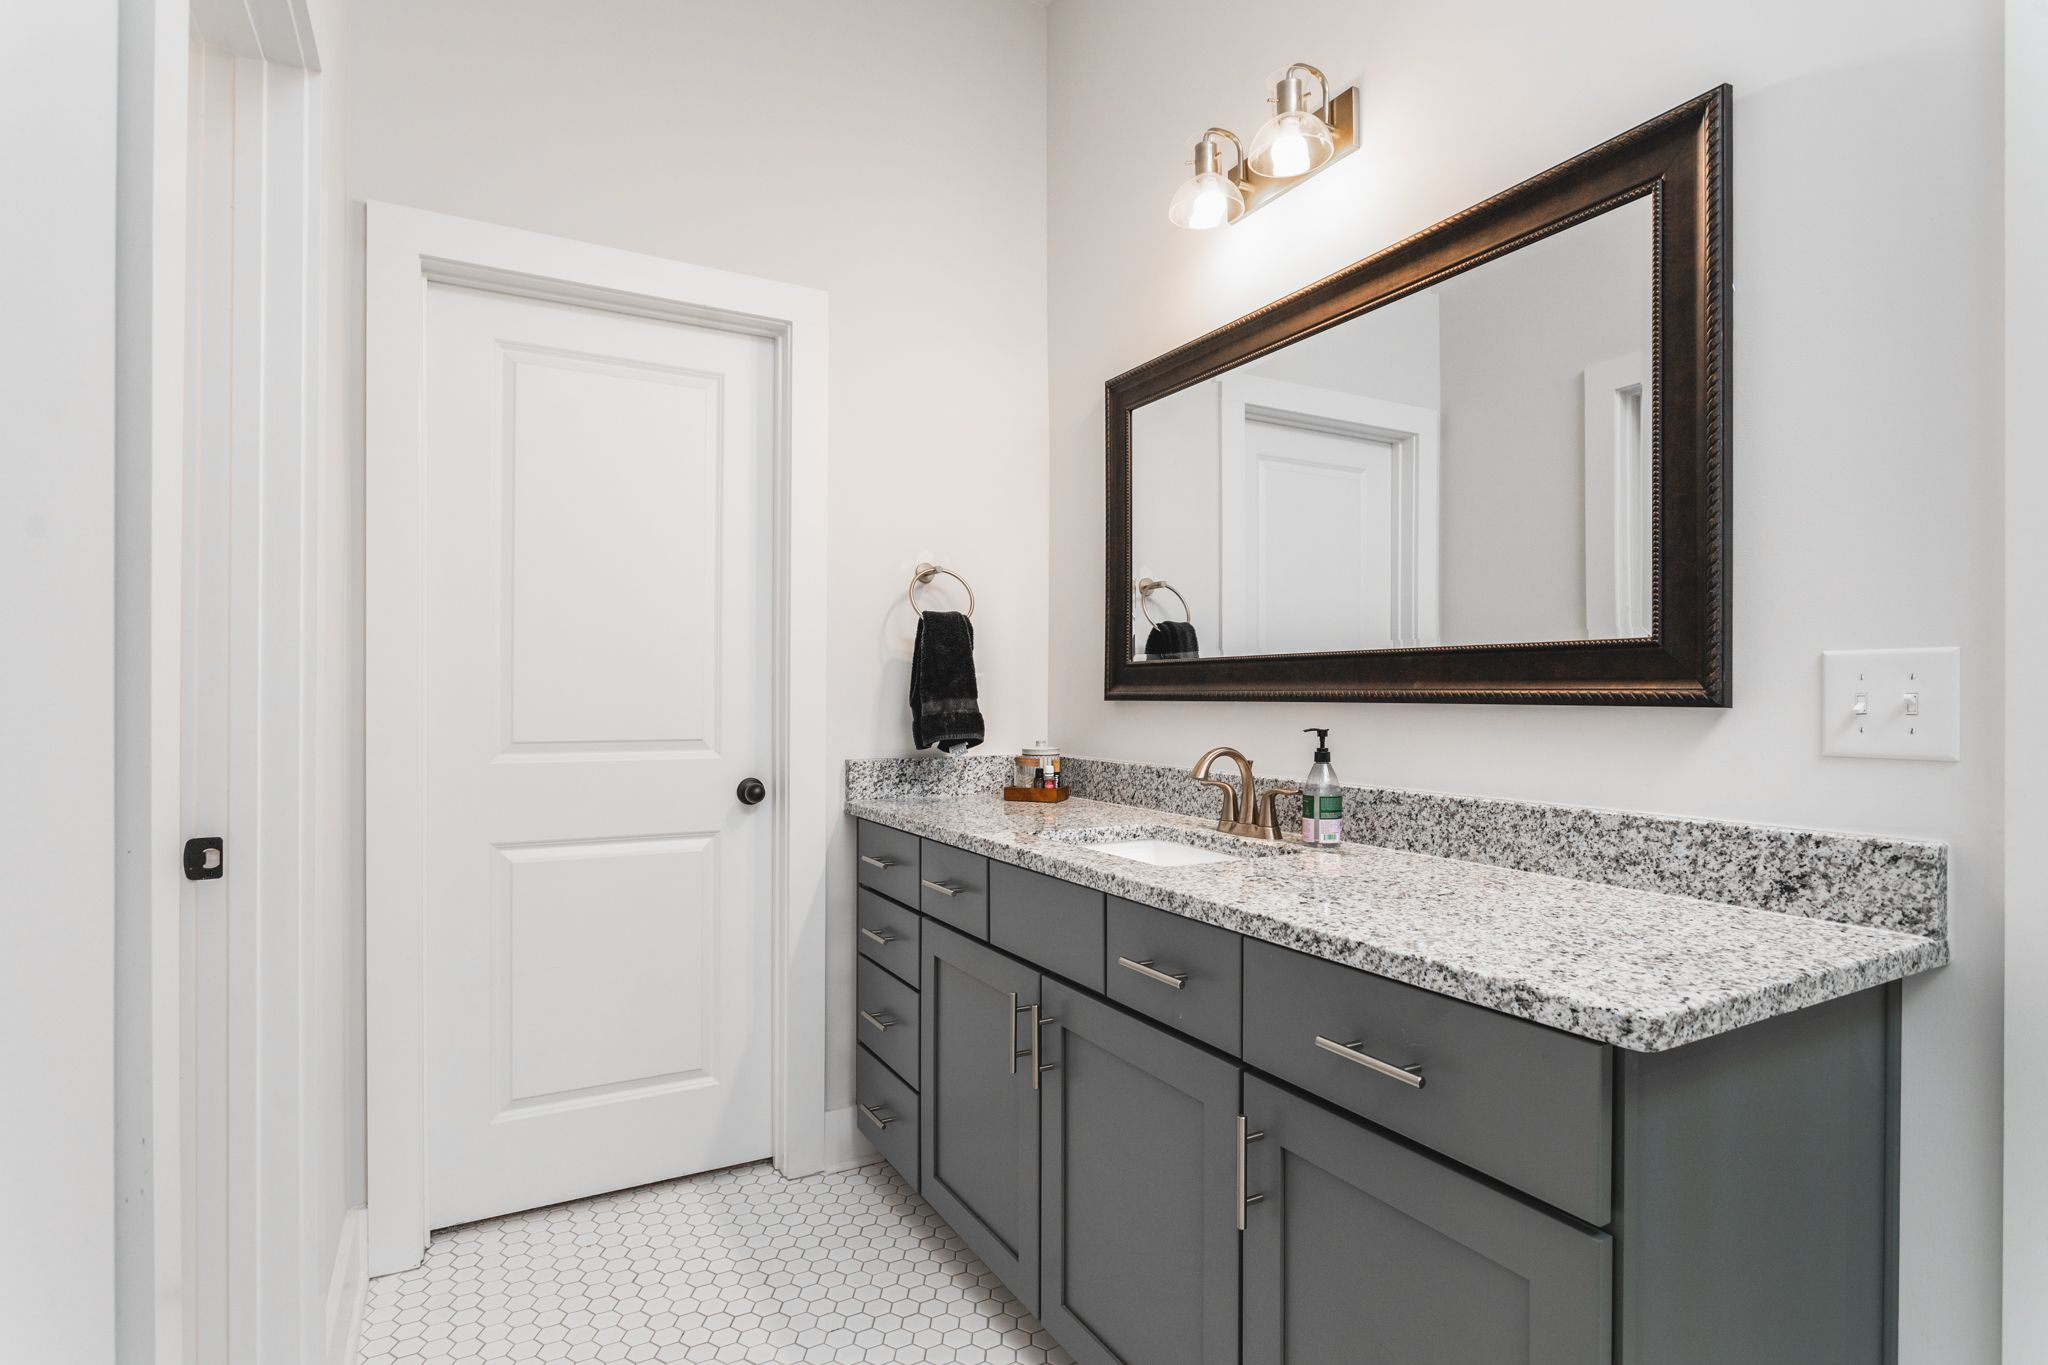 Bathroom featured in The Sawgrass By Holland Homes in Auburn-Opelika, AL